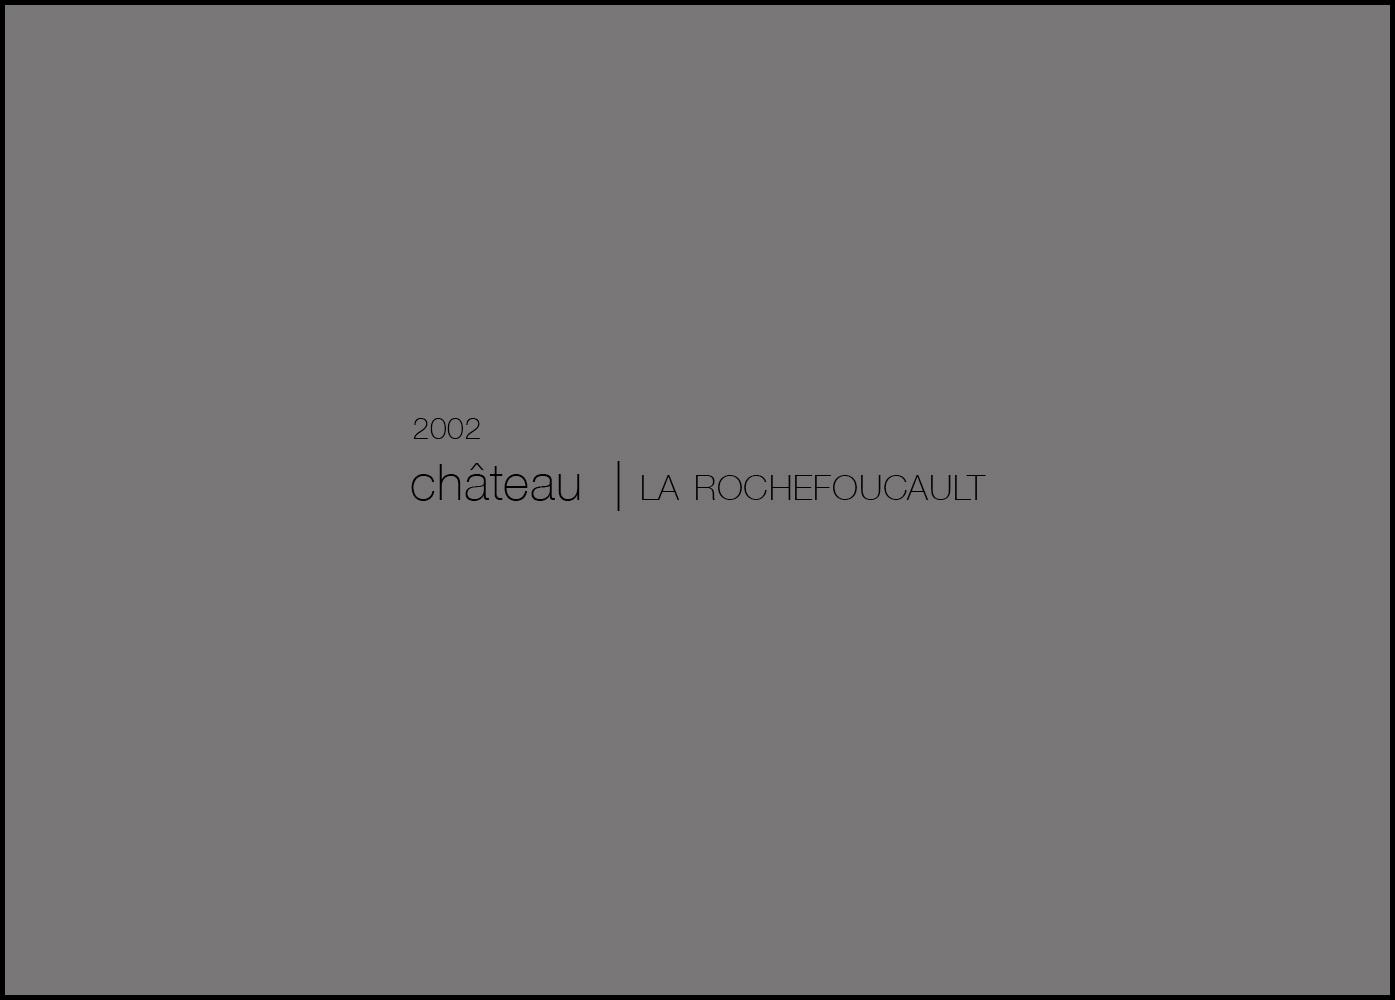 2002_04Chateau-Rochefoucault-00